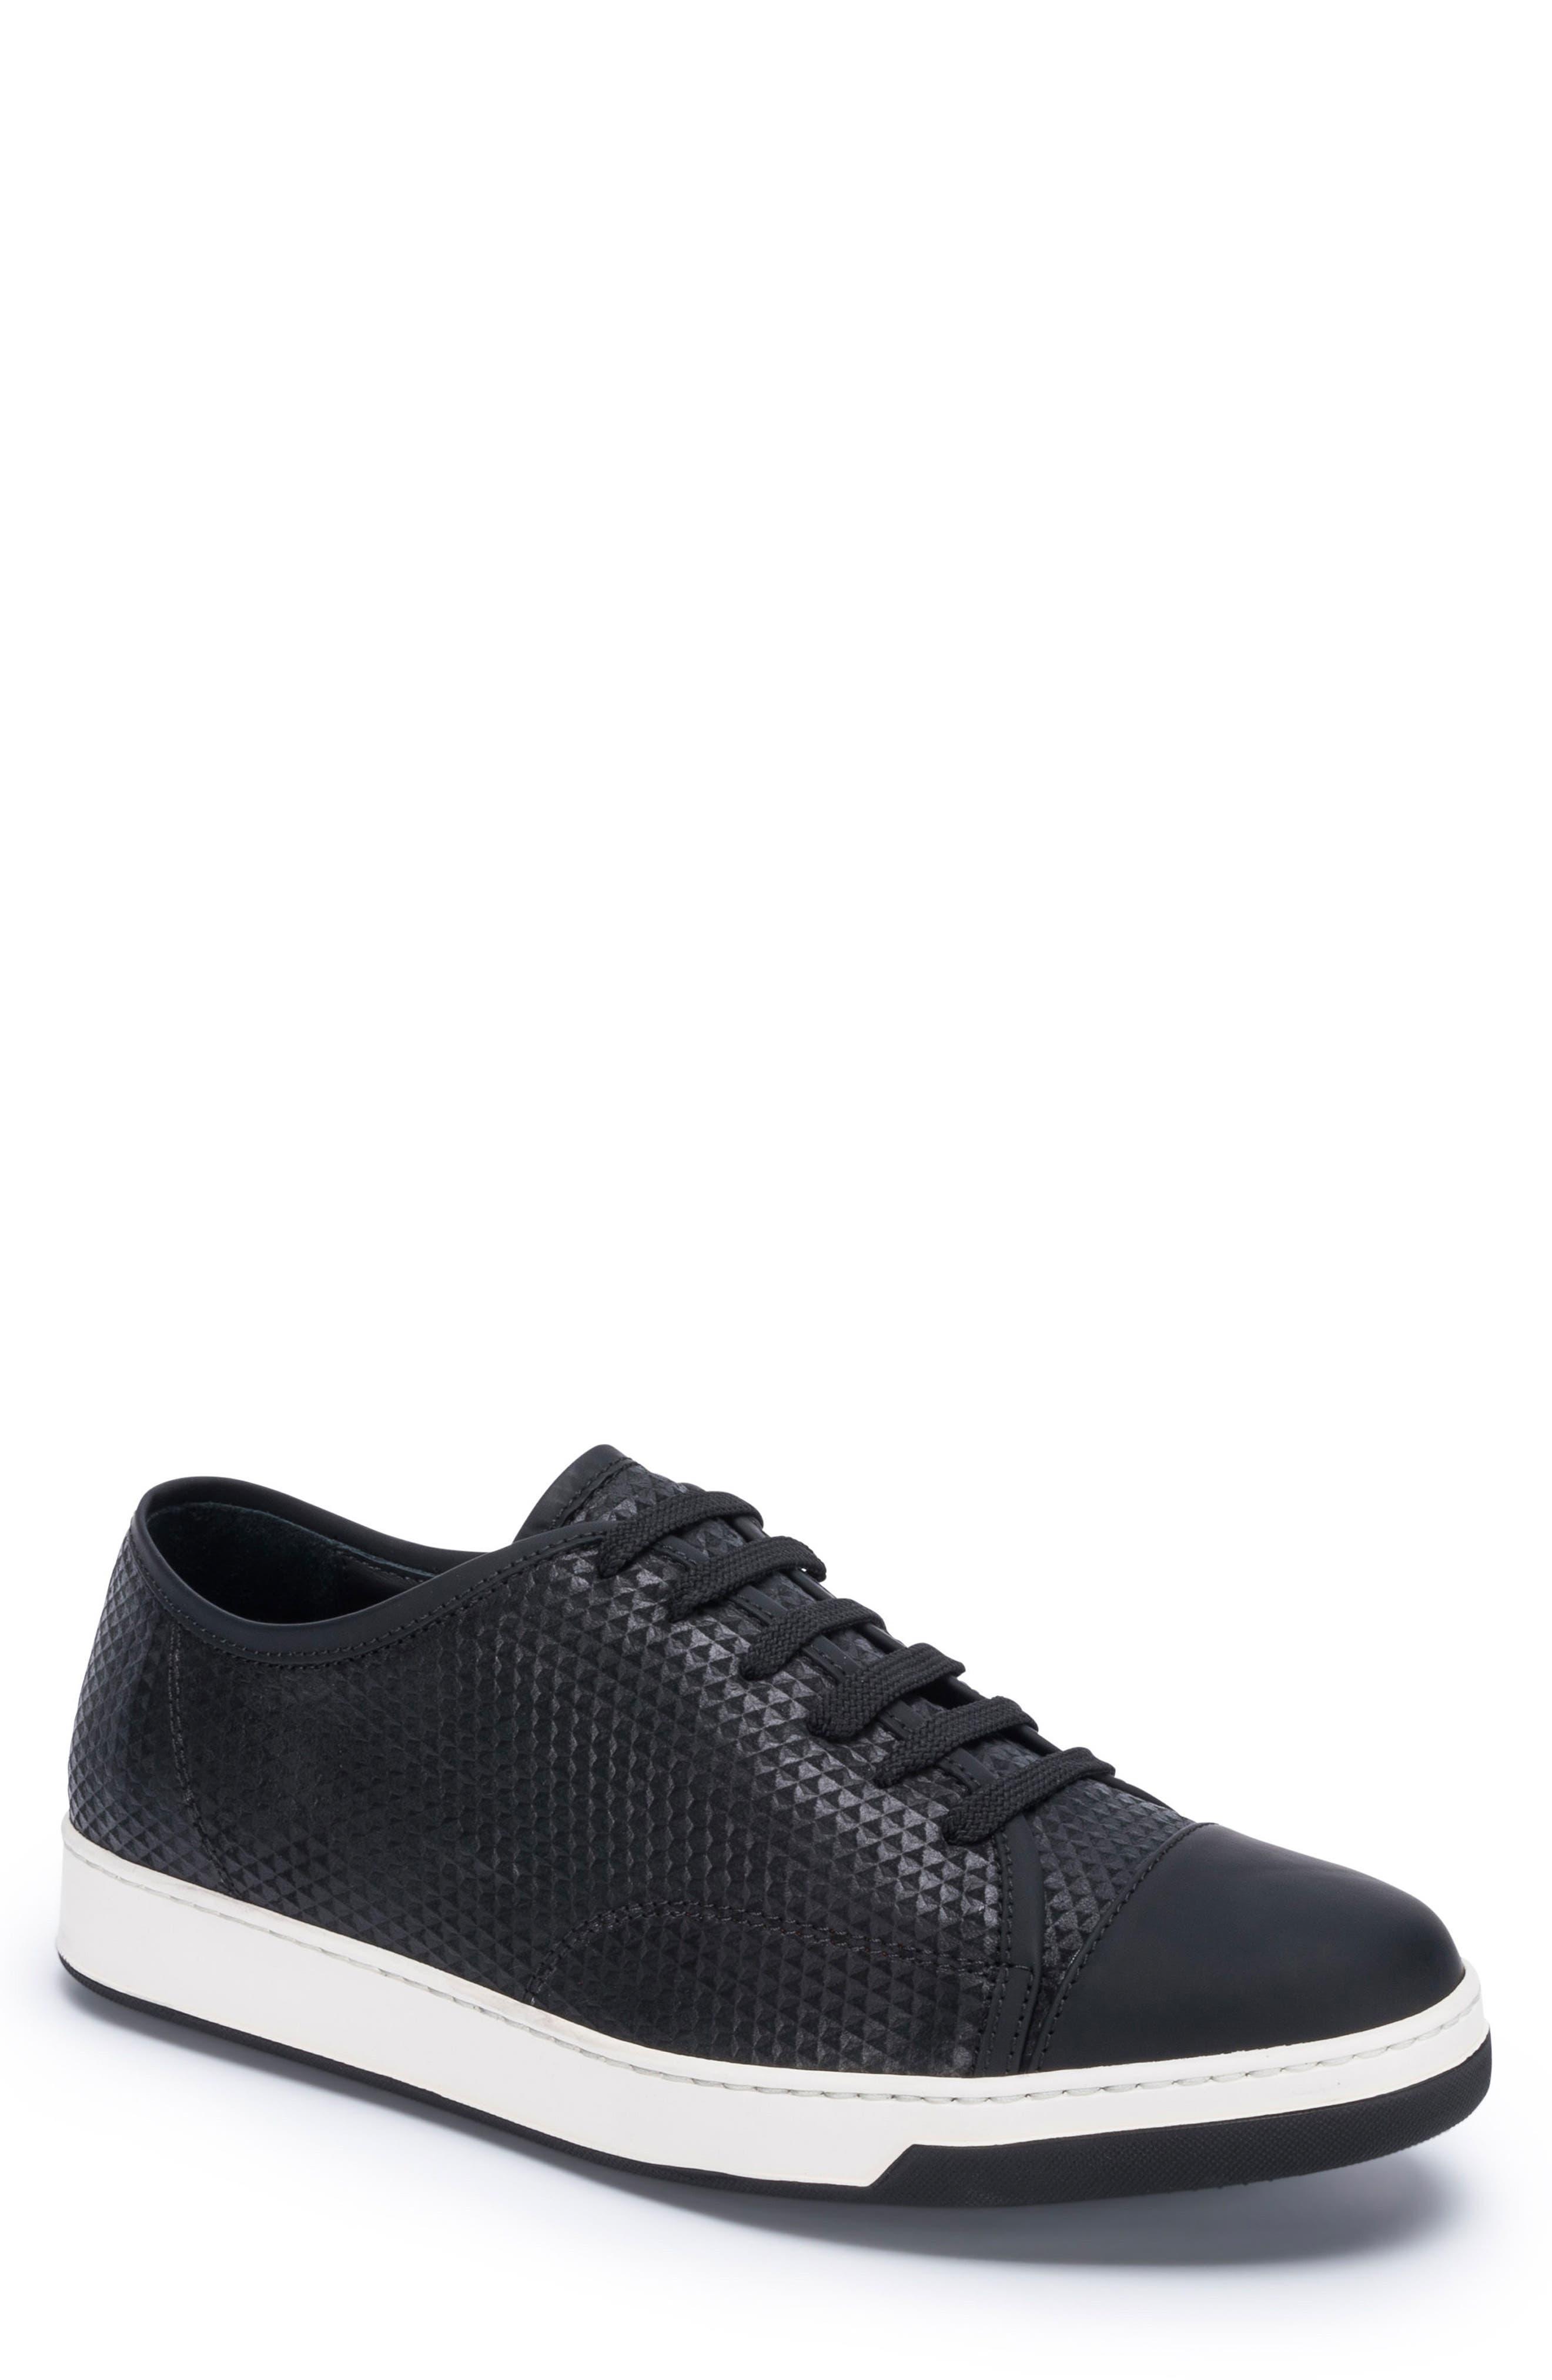 Ischia Sneaker,                         Main,                         color, Black